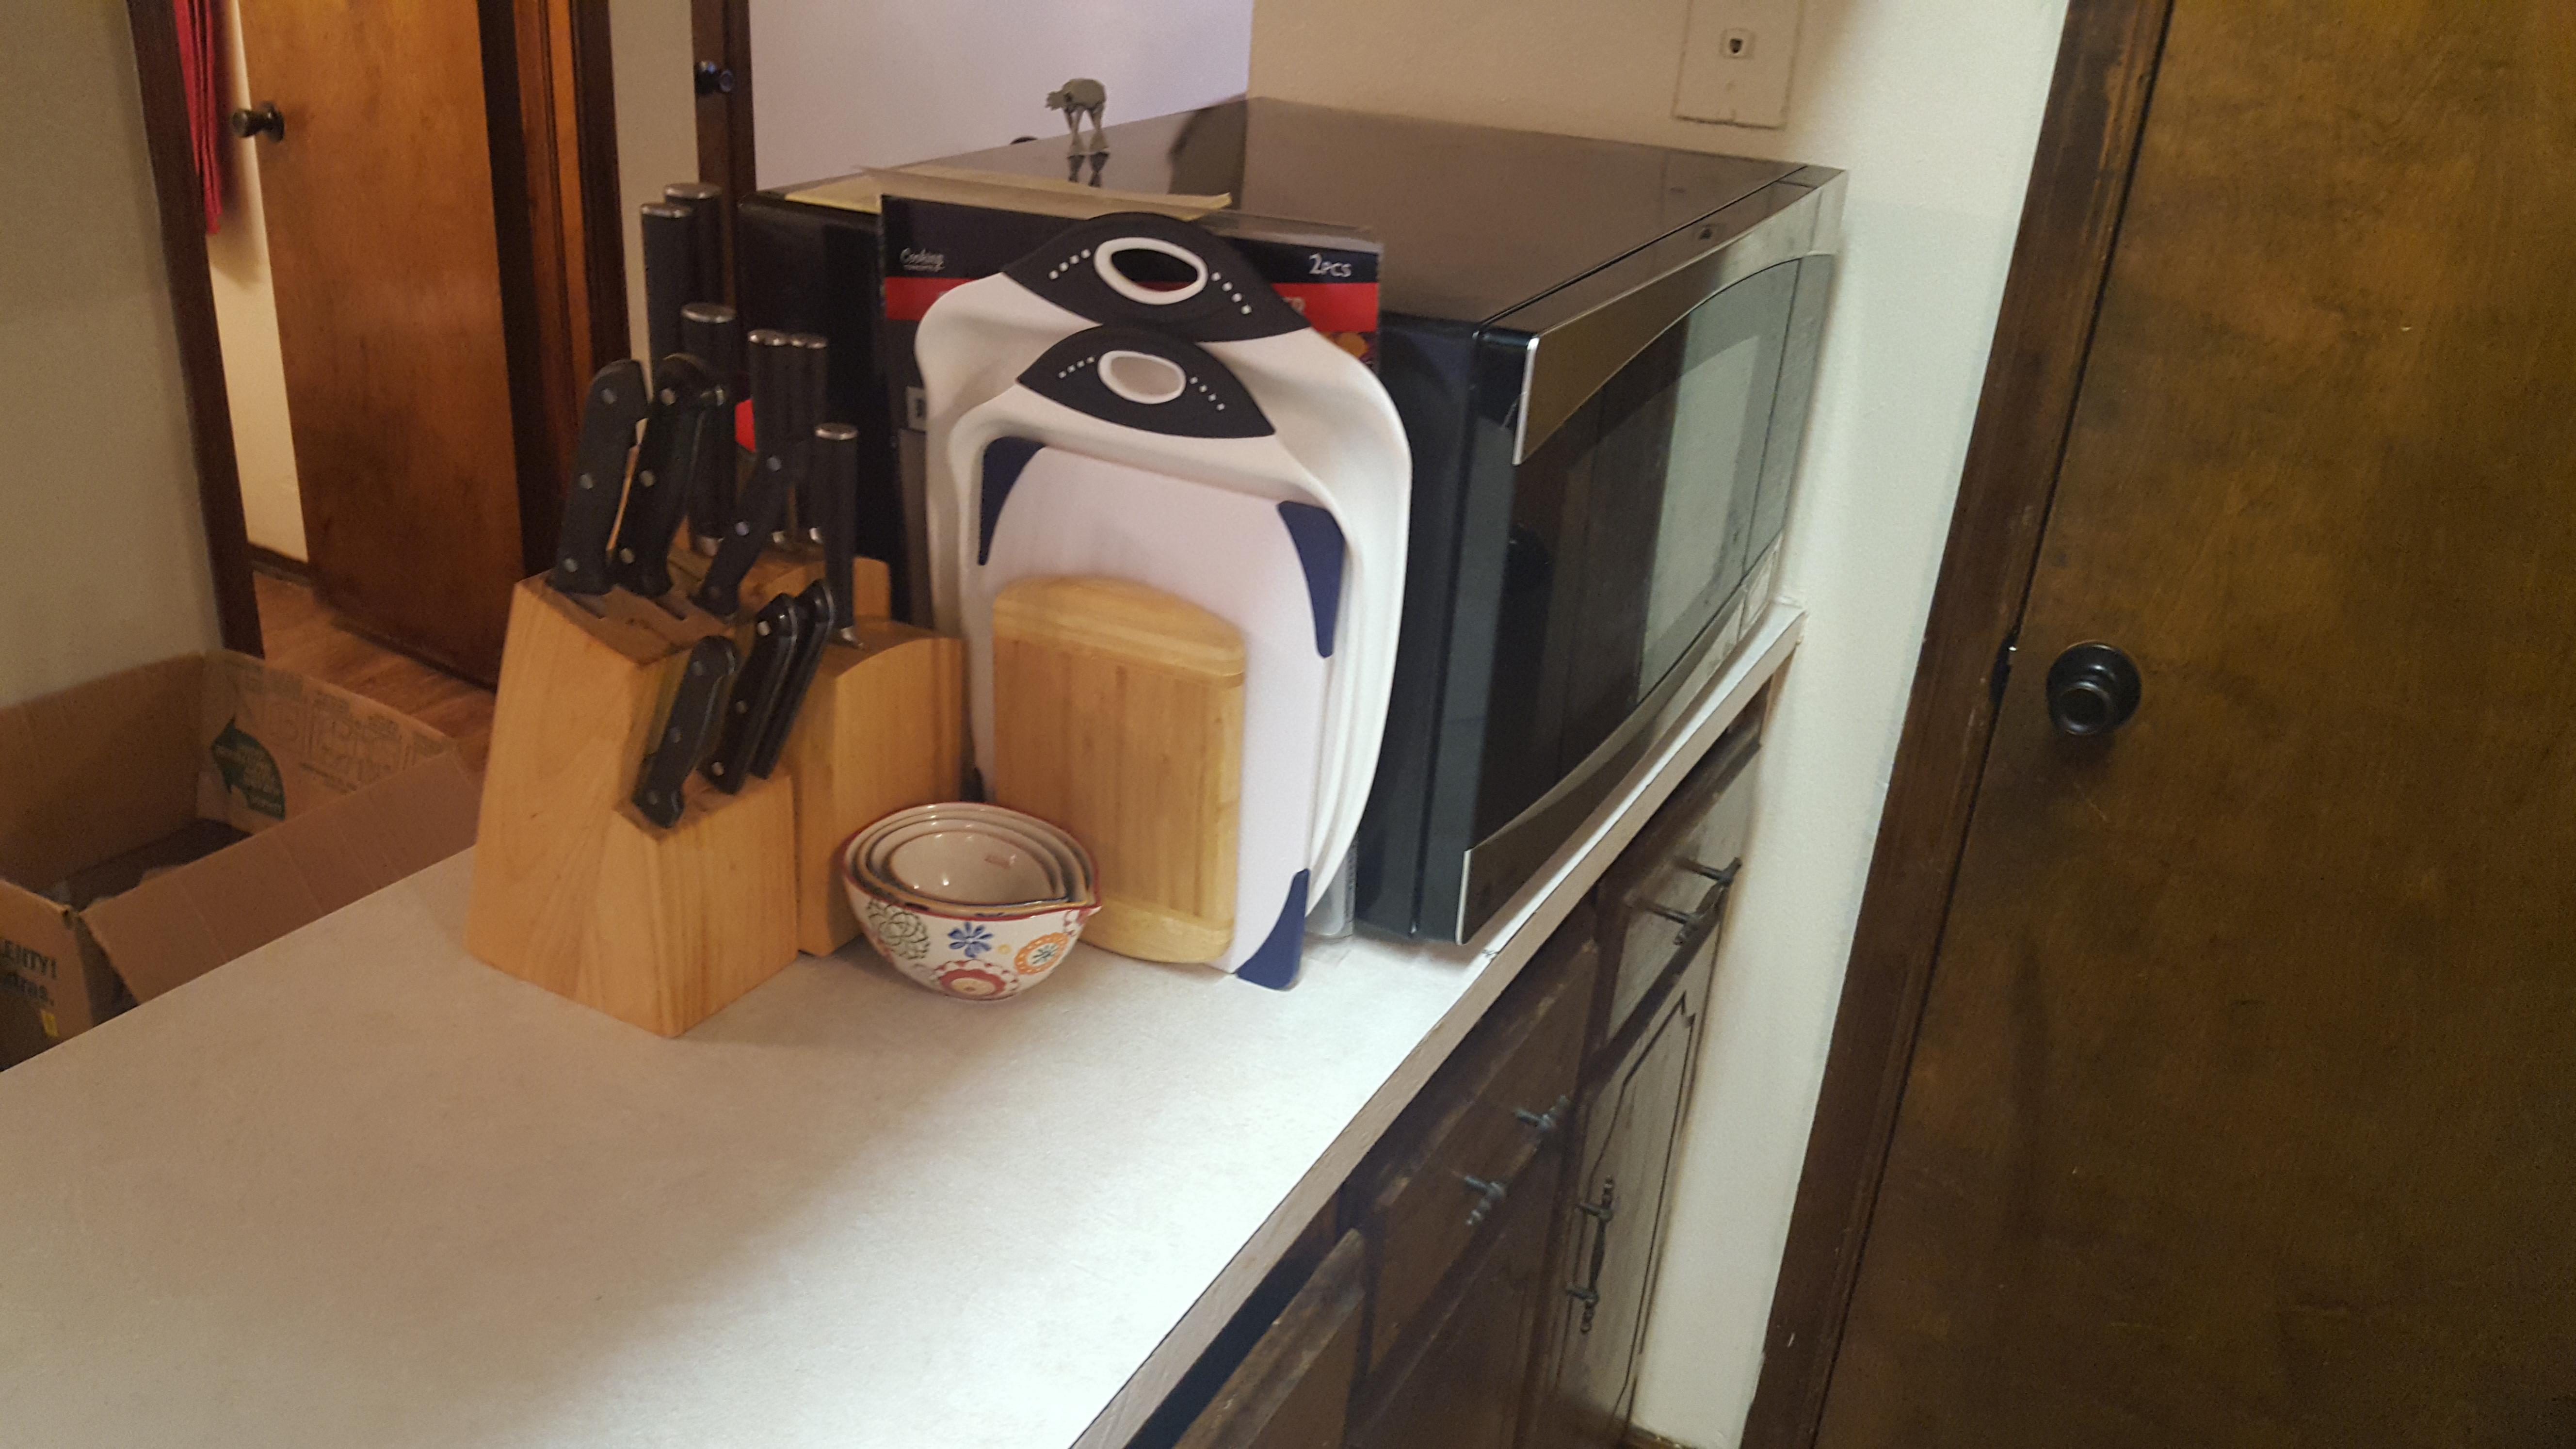 Kitchen Unpack Better (1/3)